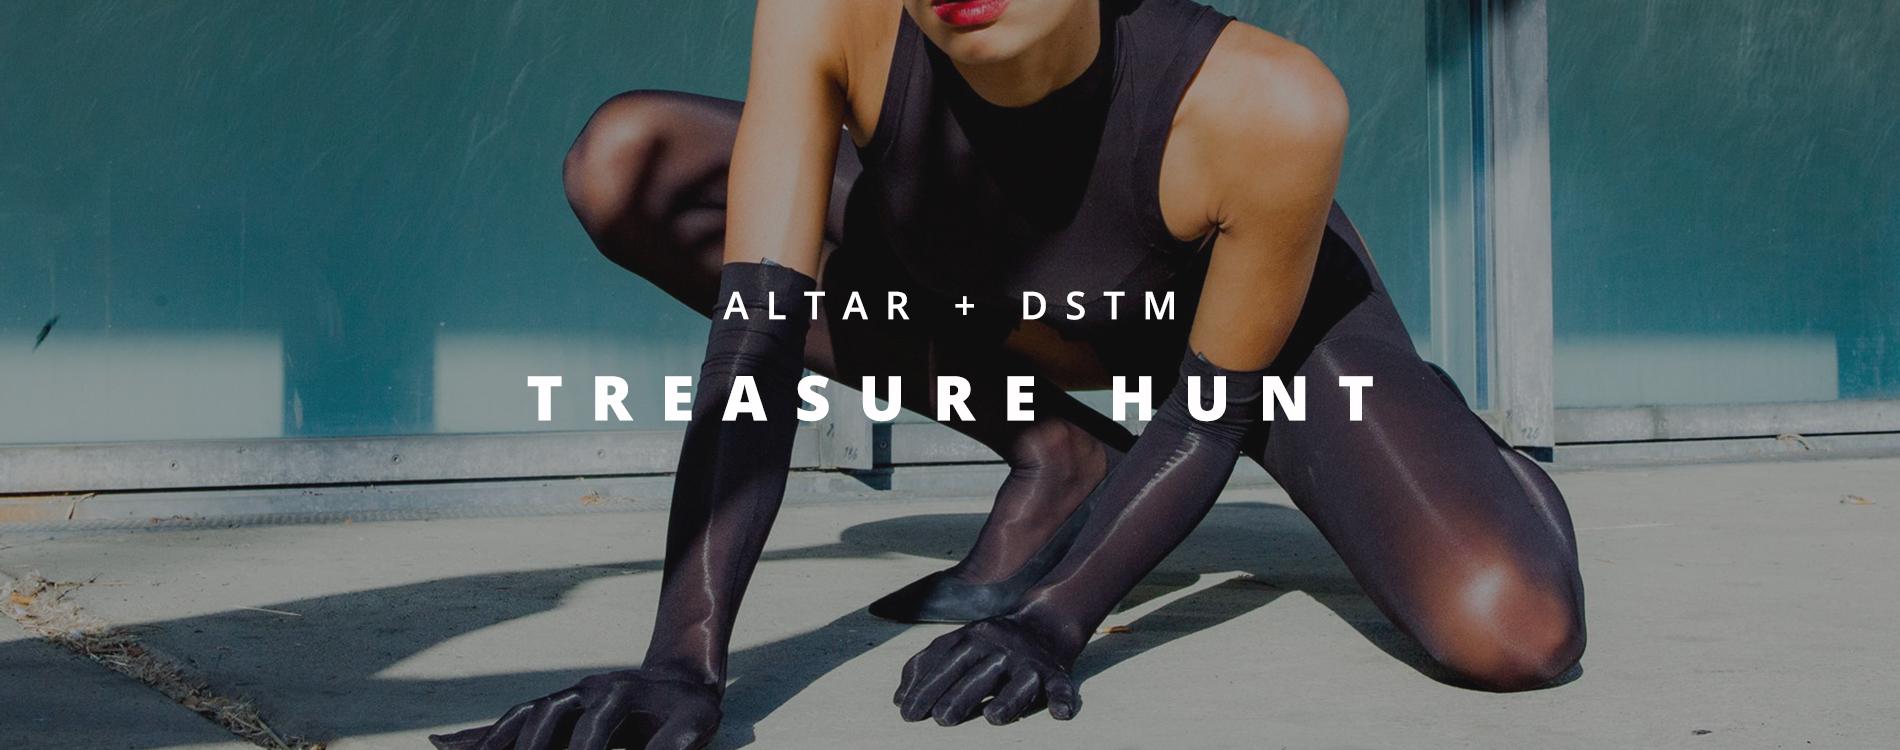 Altar + DSTM - Easter Treasure Hunt